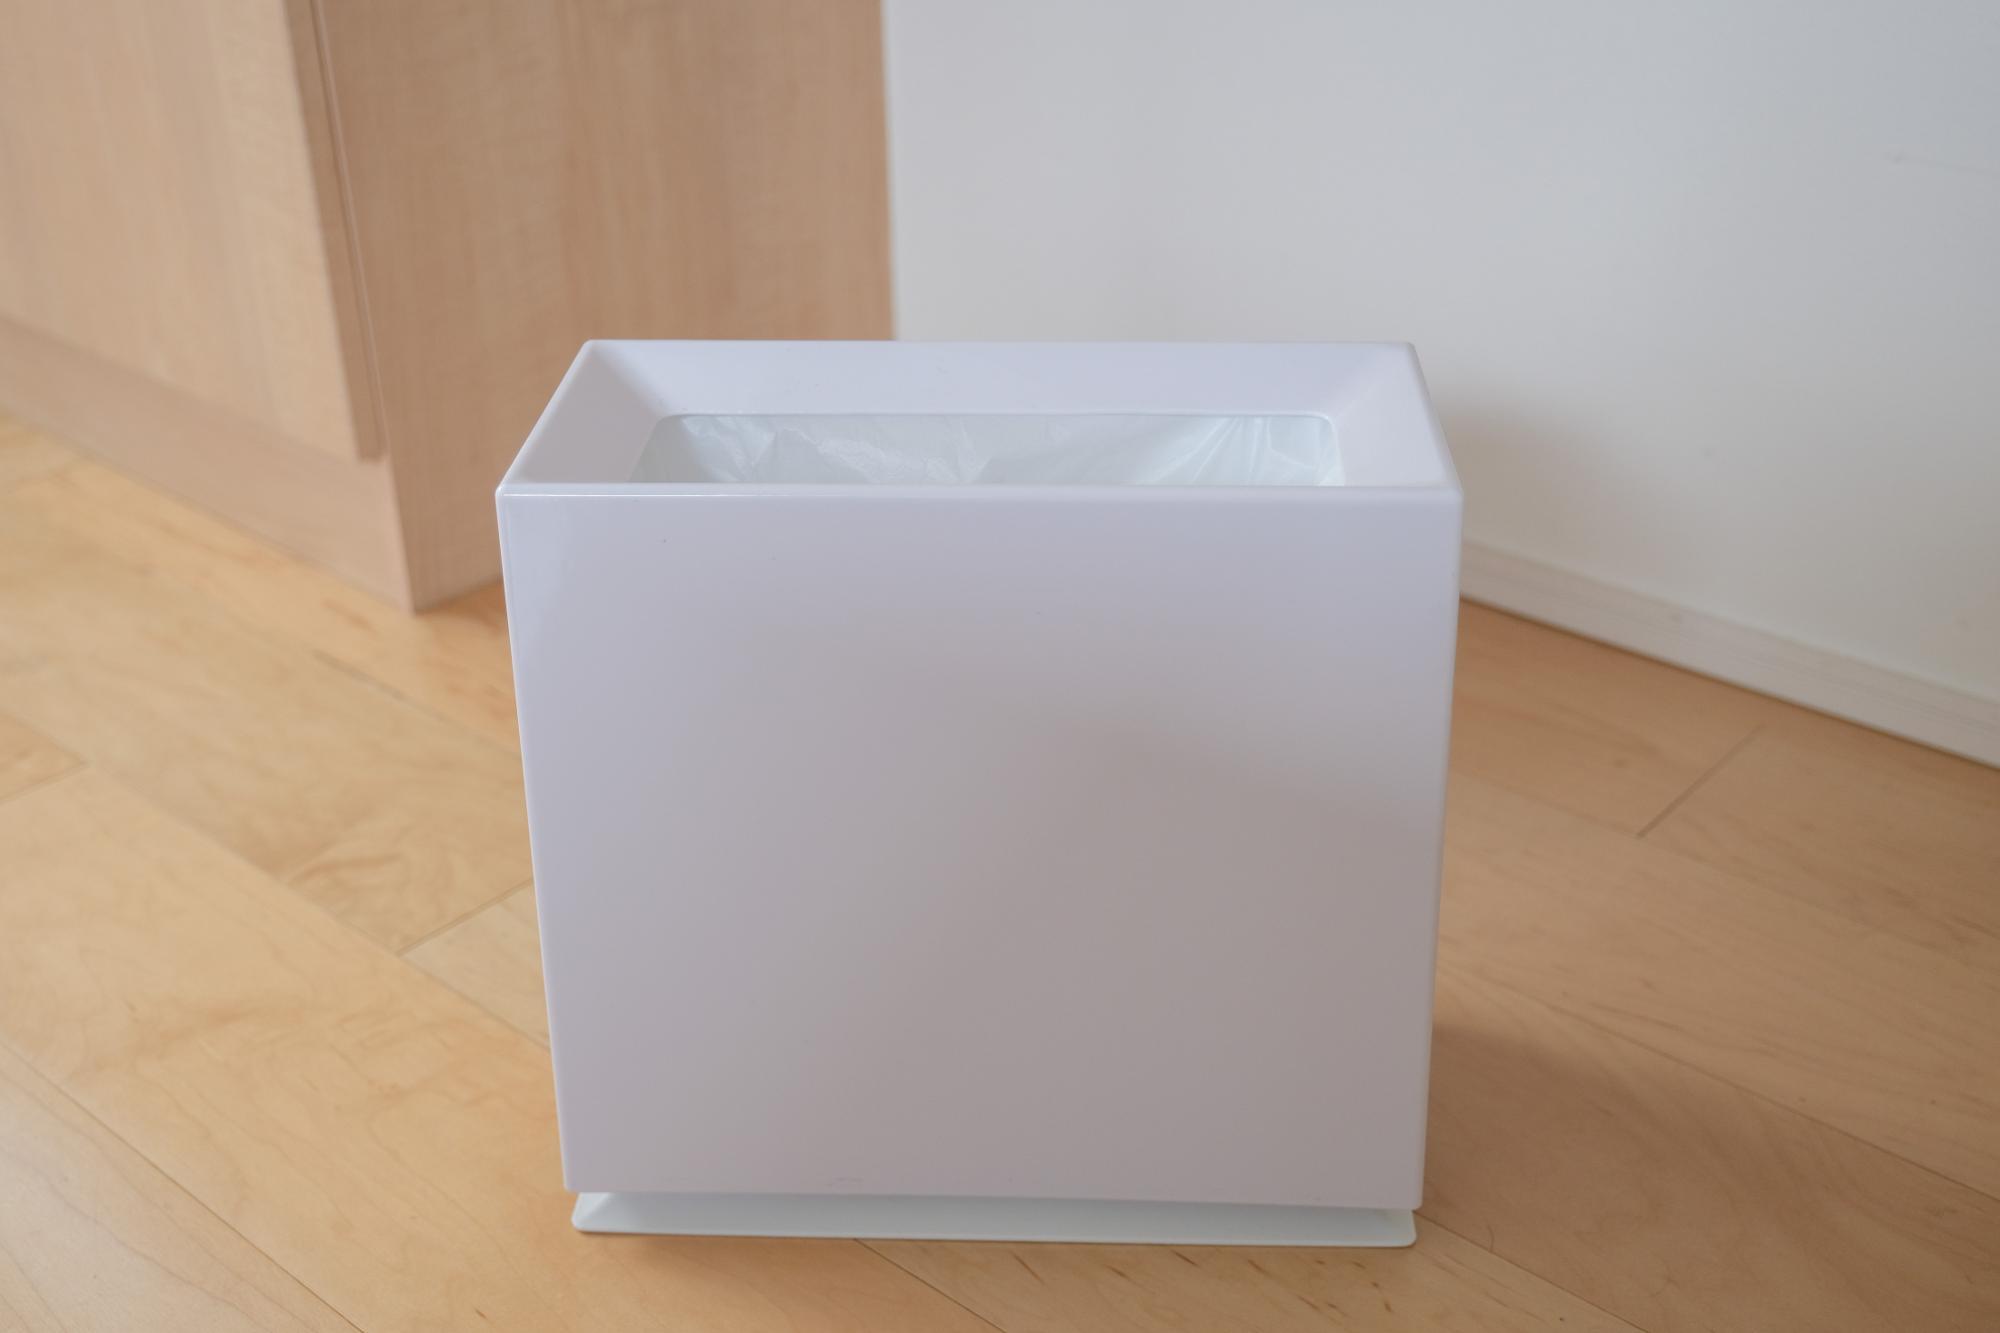 ideacoのカバー付きゴミ箱